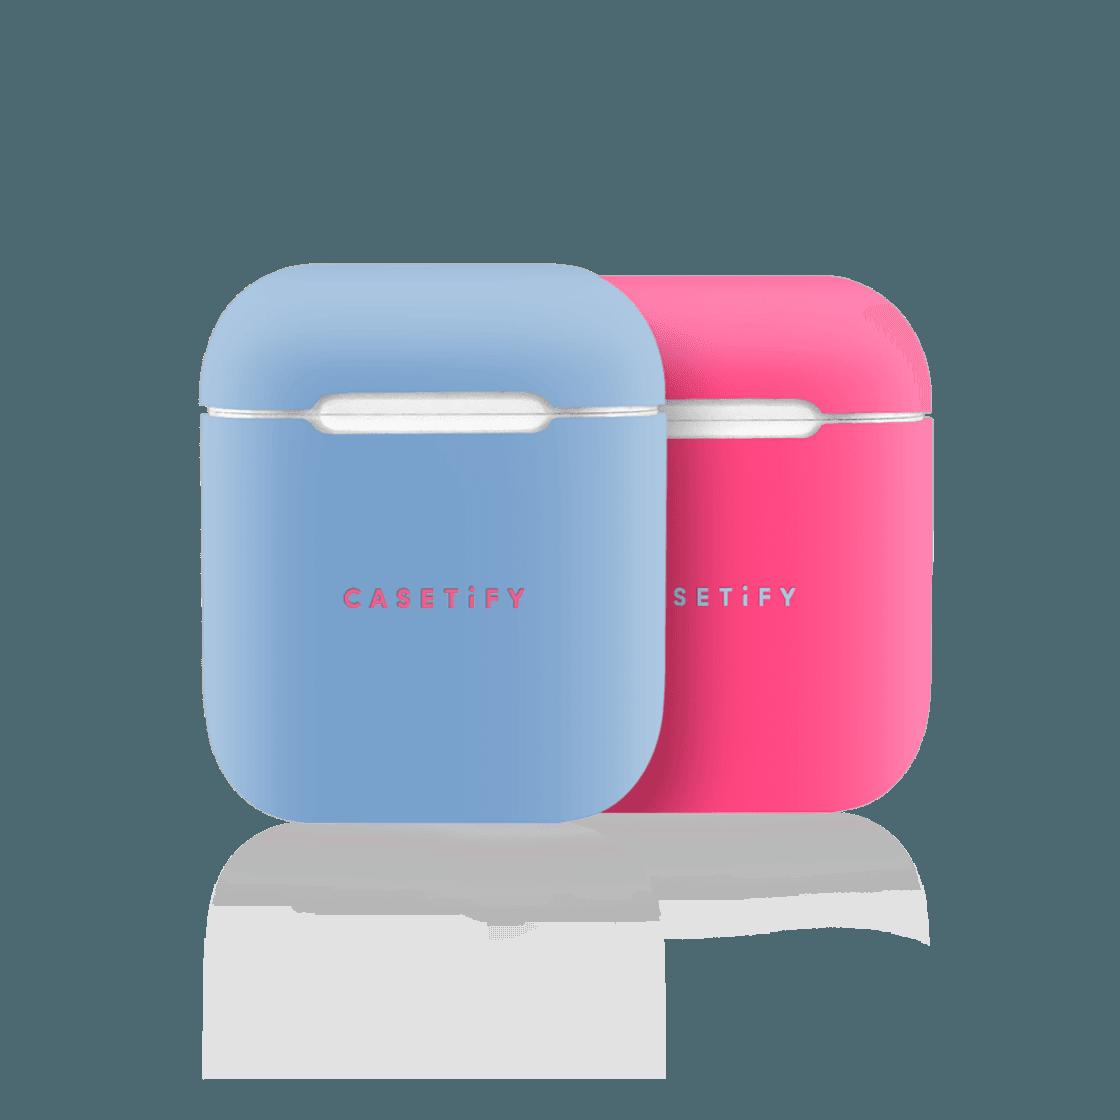 iPhone 7 Plus/7/6 Plus/6/5/5s/5c Case - Neon AirPods Case Skin (2 sets) Blue/Pink